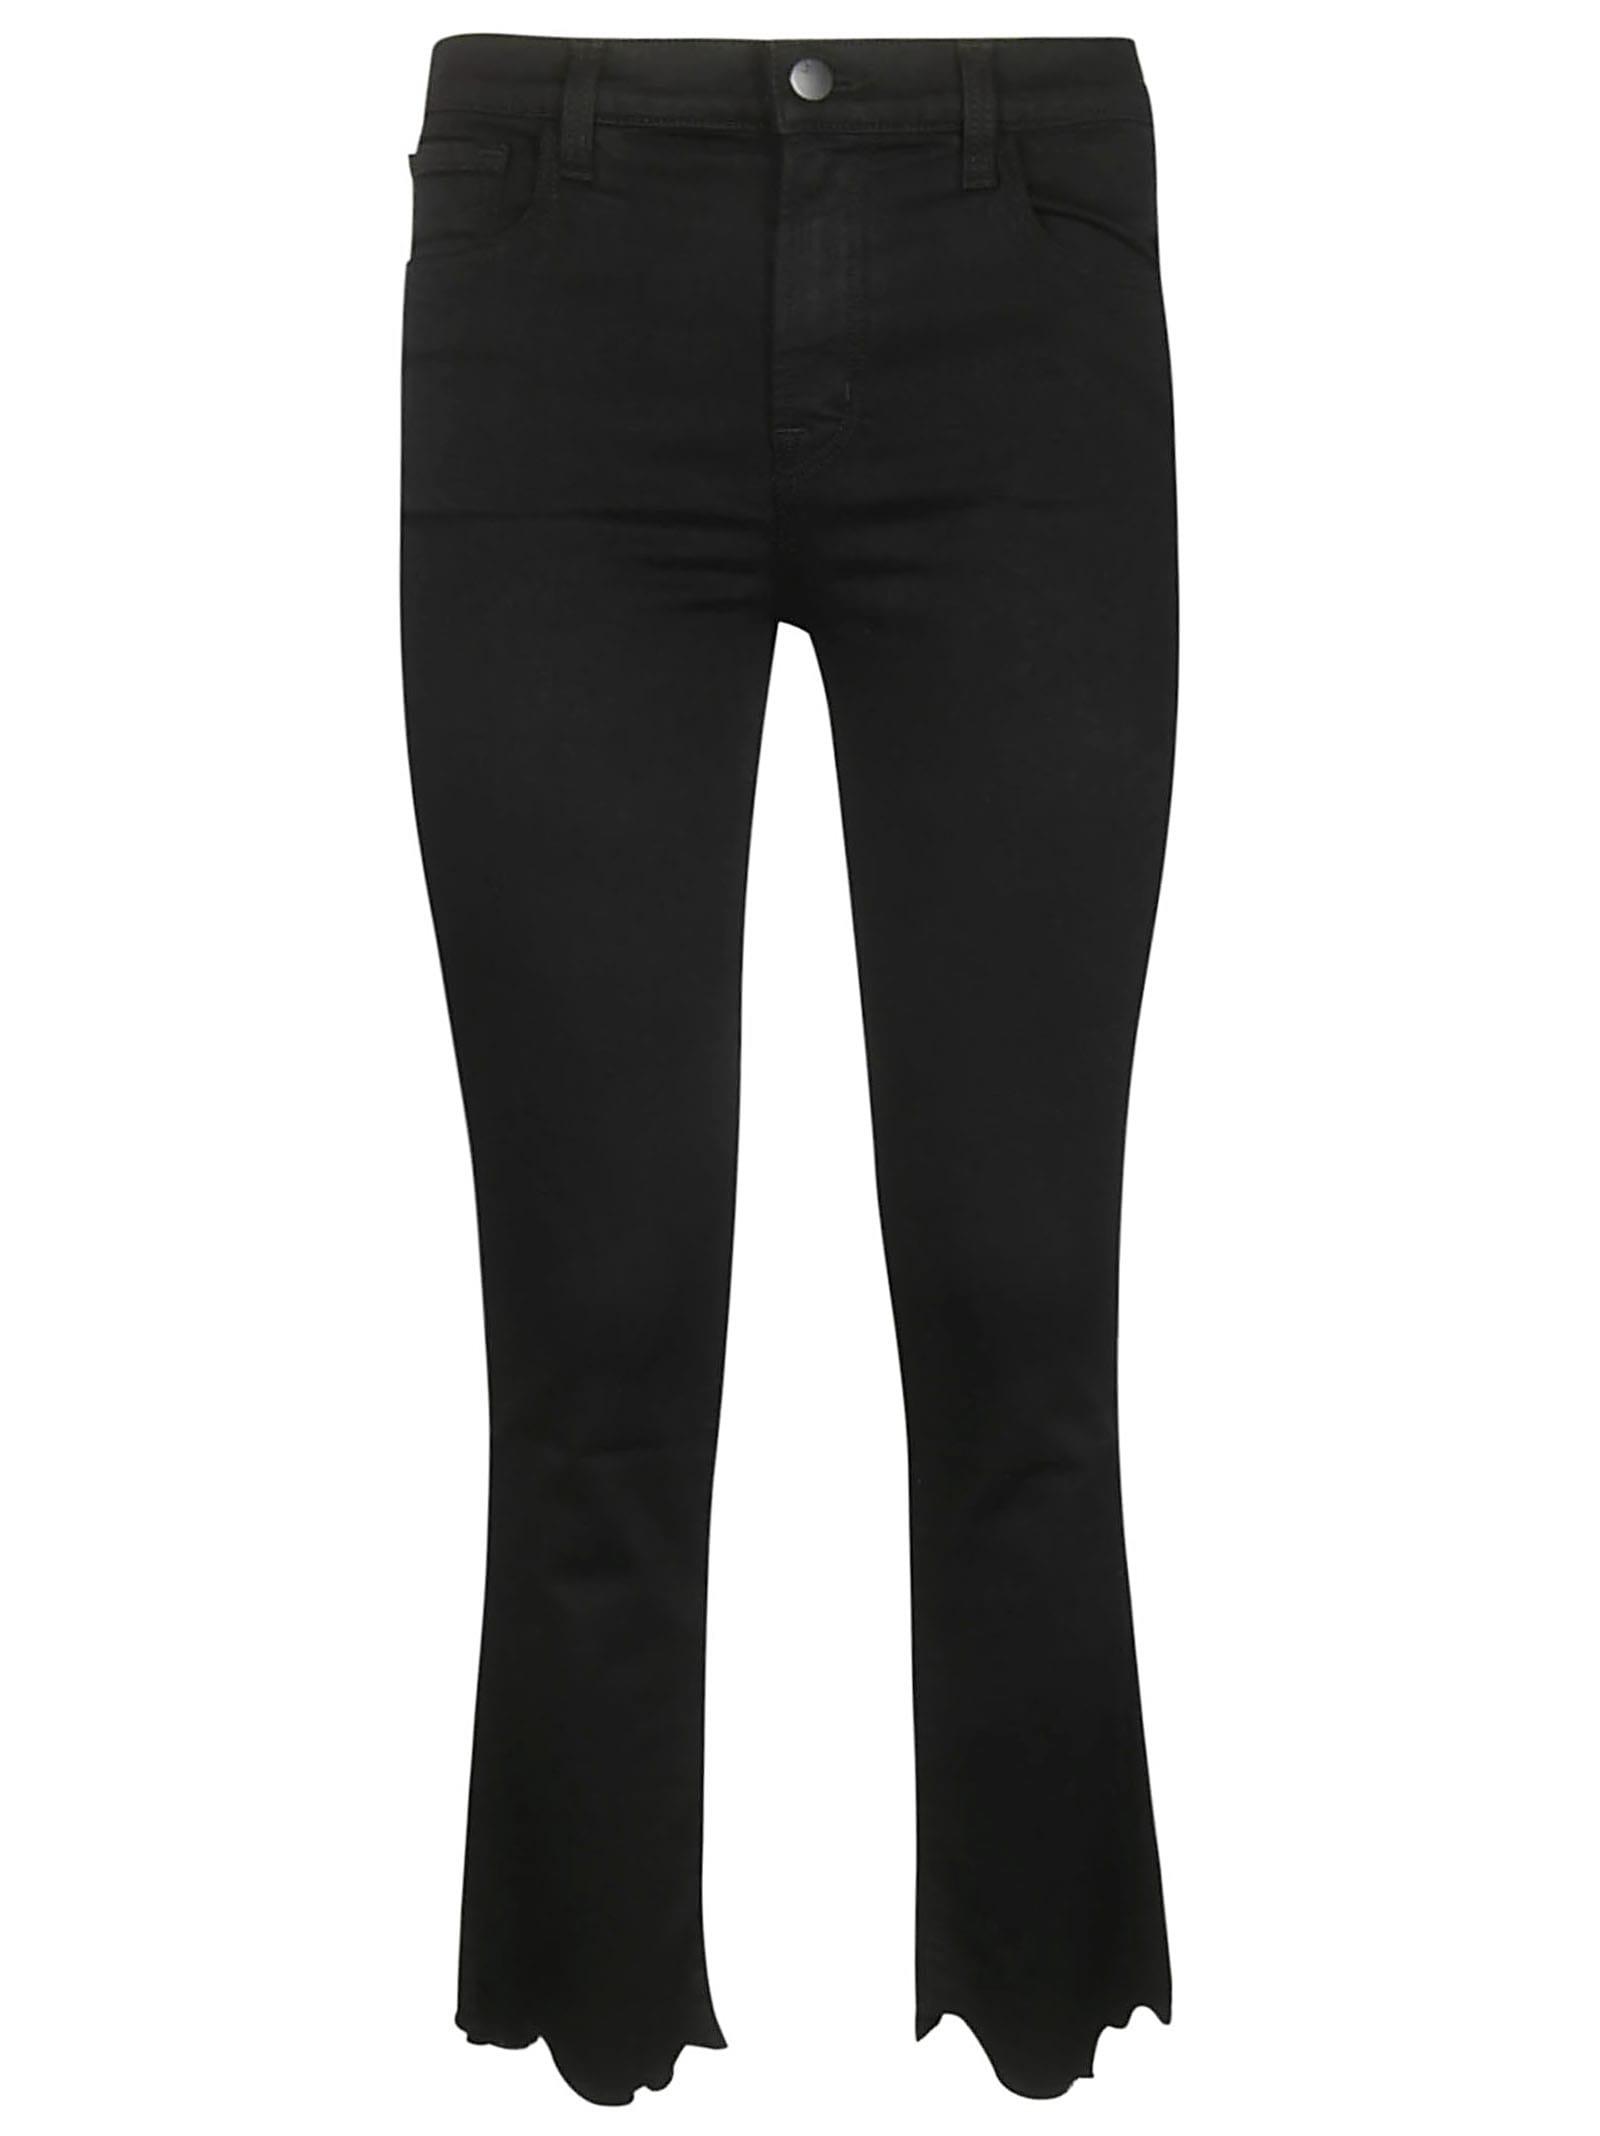 J Brand Skinny Fit Trousers